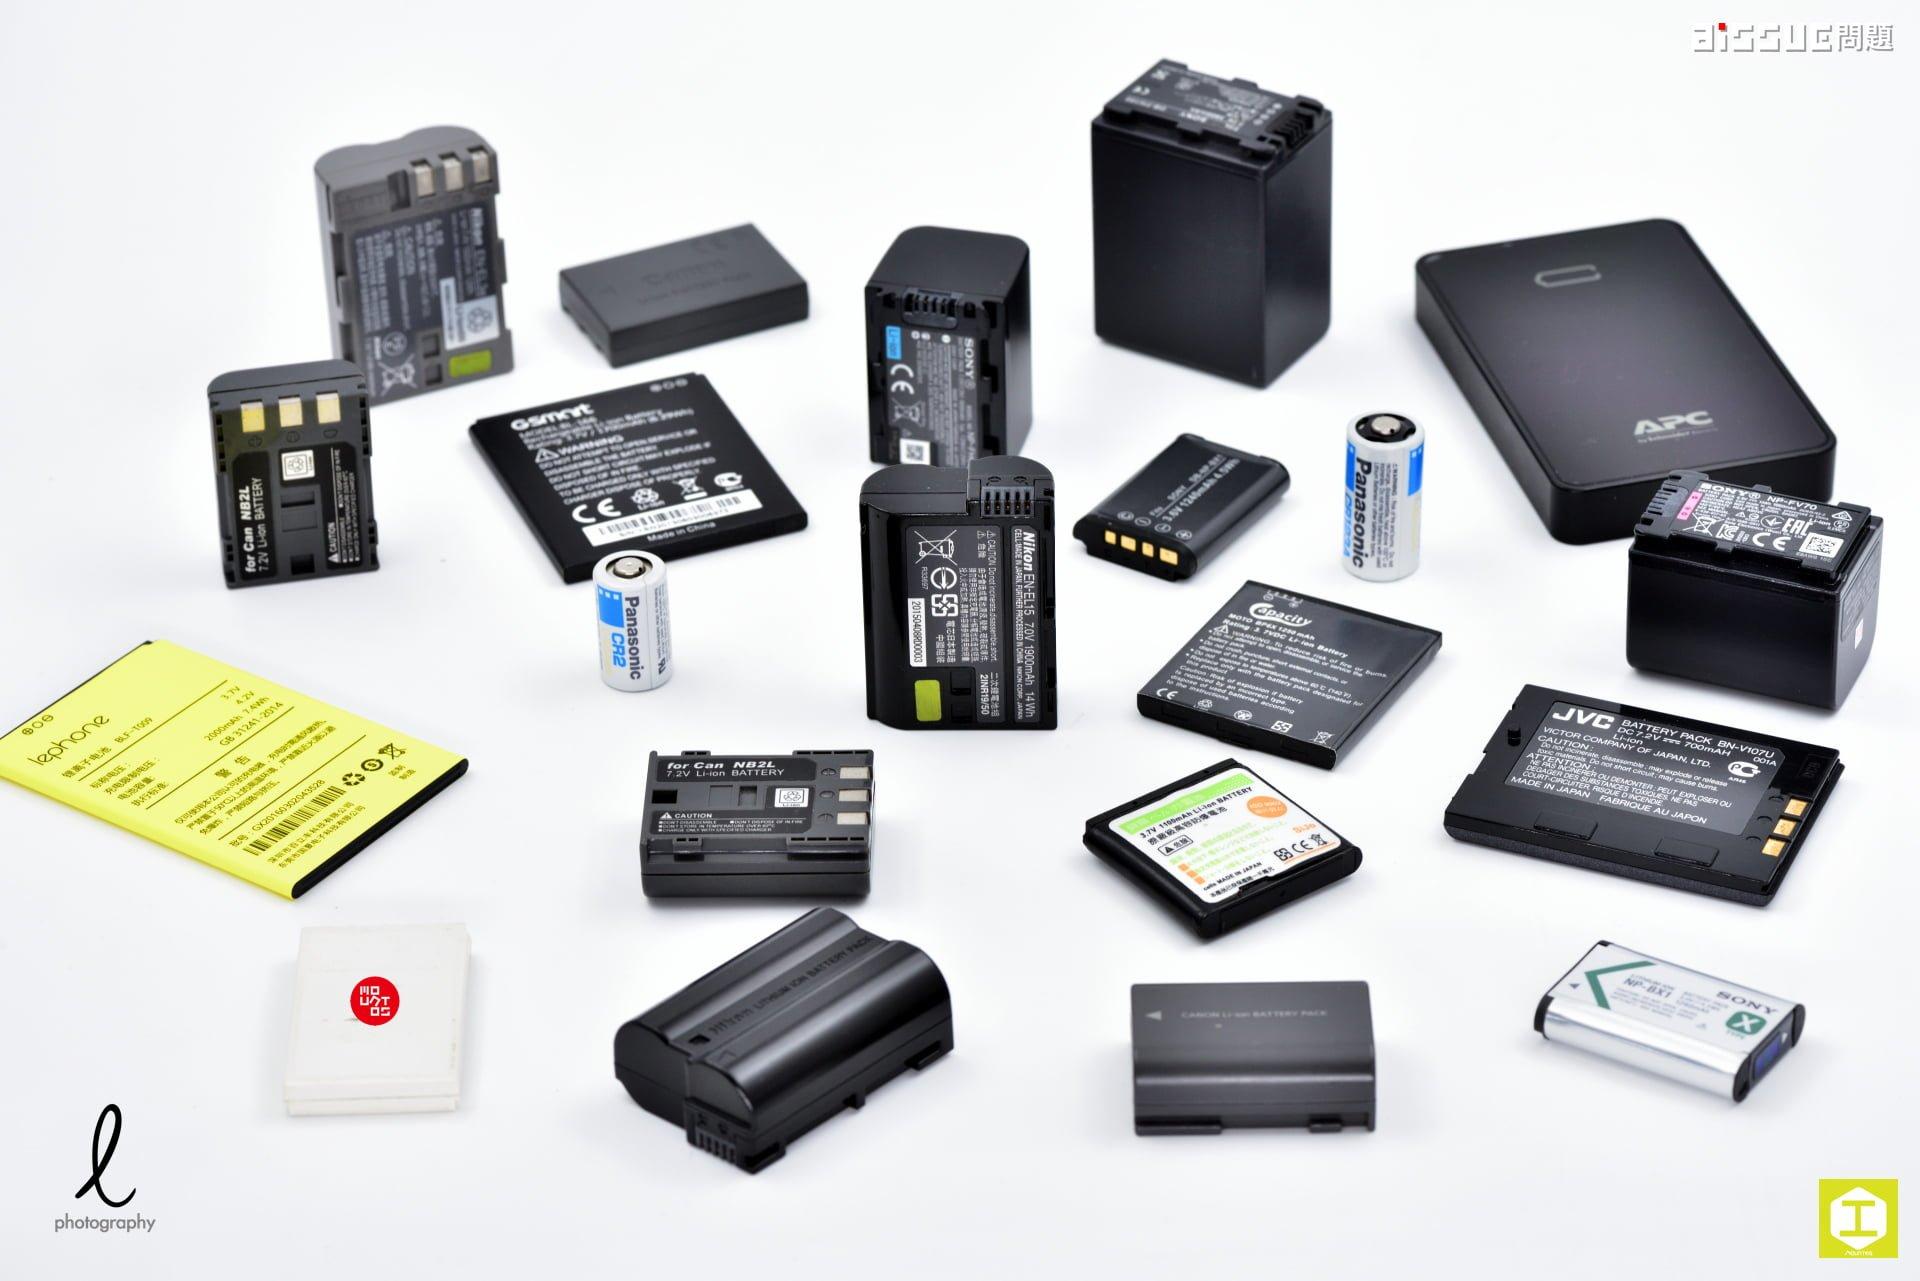 Li Ion Battery Smartphone Camera 1 電池漏液,彈簧片遭電解液腐蝕可修理?電子產品還能用嗎?